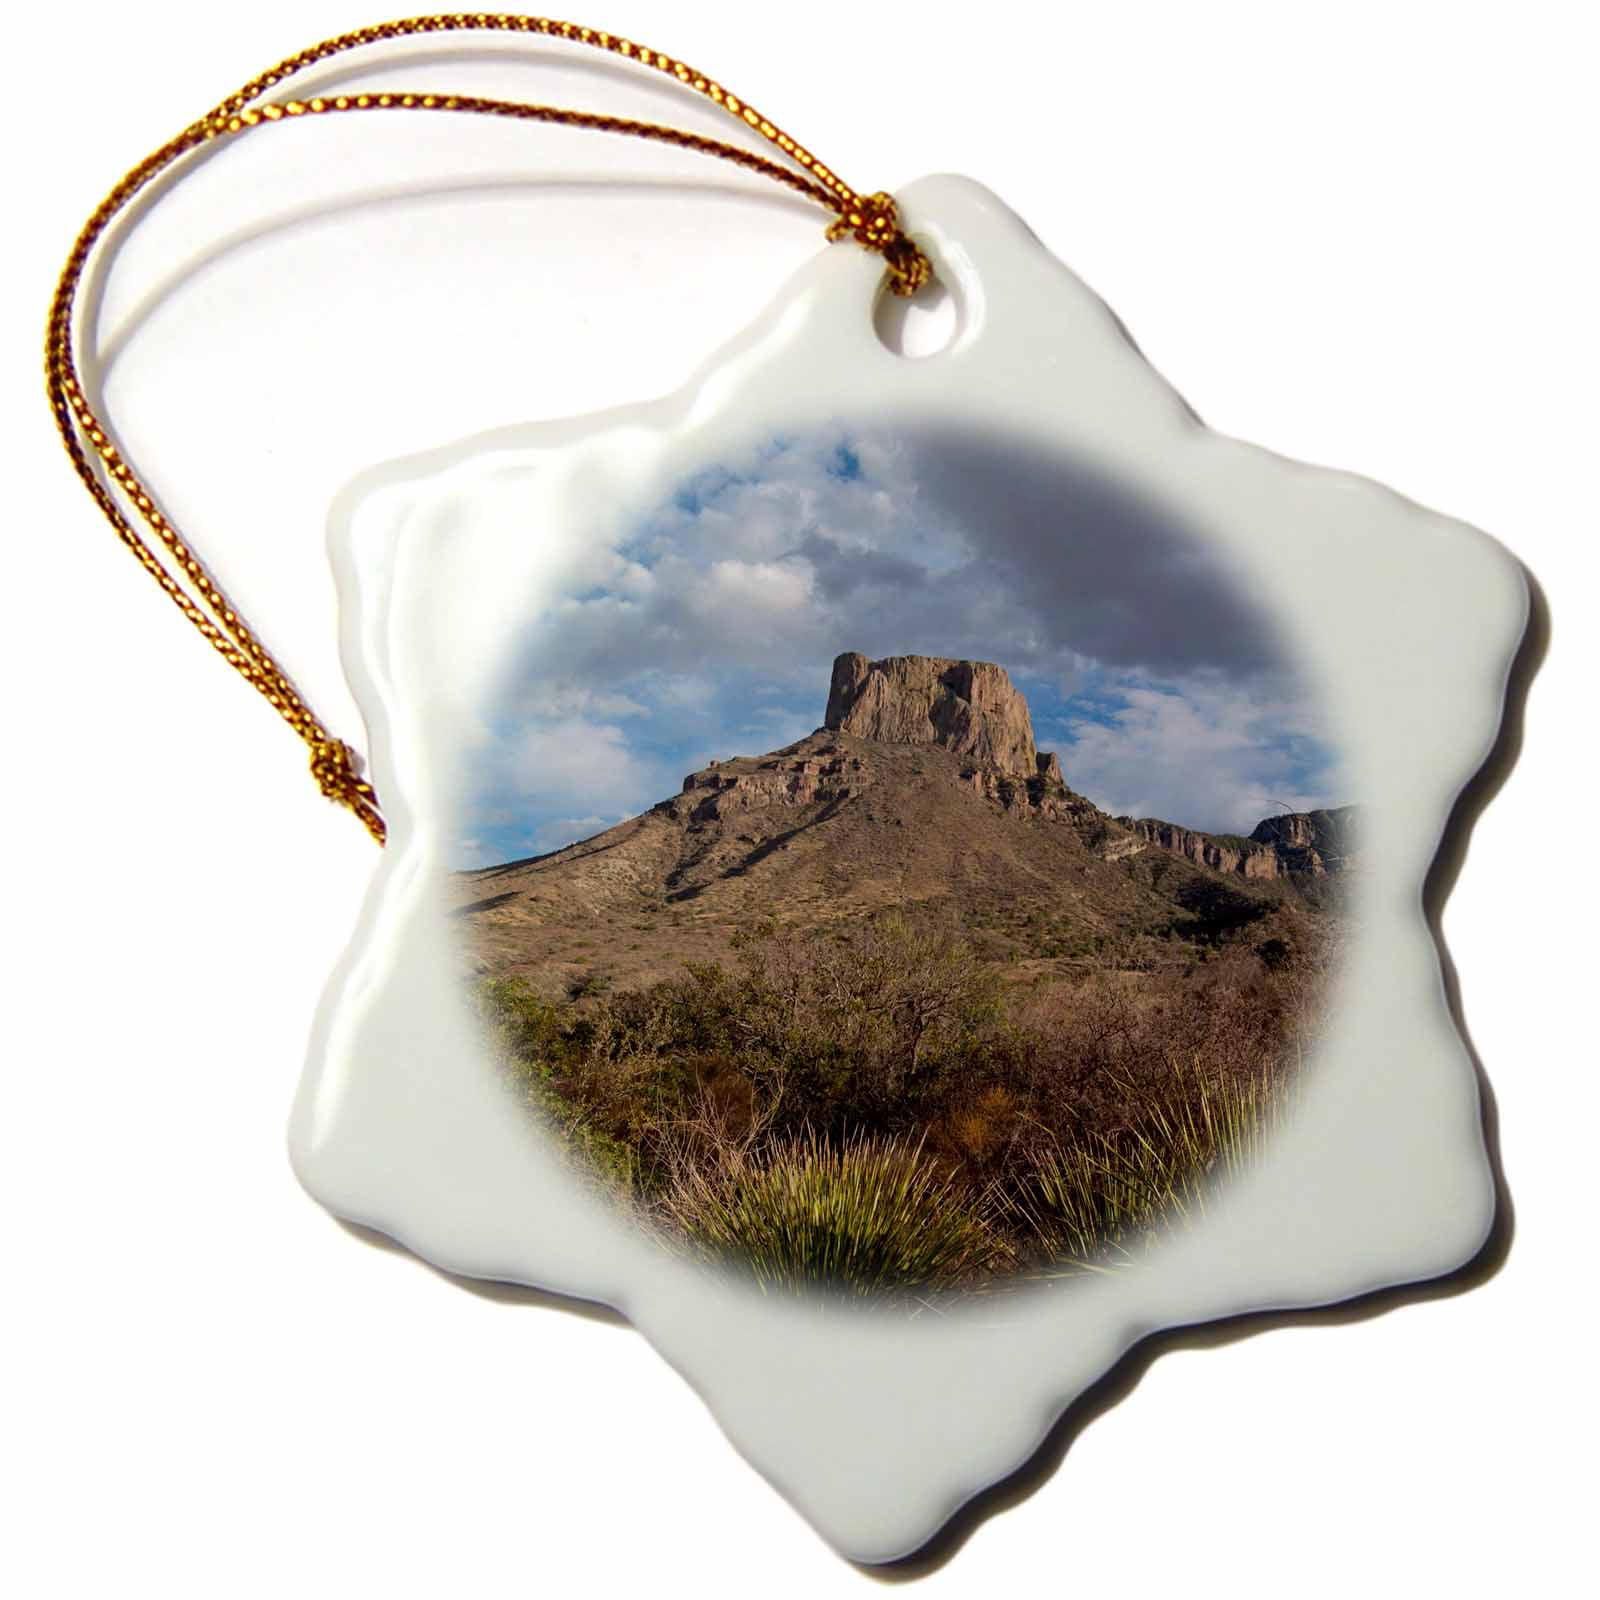 3dRose Casa Grande Peak, Chisos Basin, Big Bend National Park, Texas, USA., Snowflake Ornament, Porcelain, 3-inch